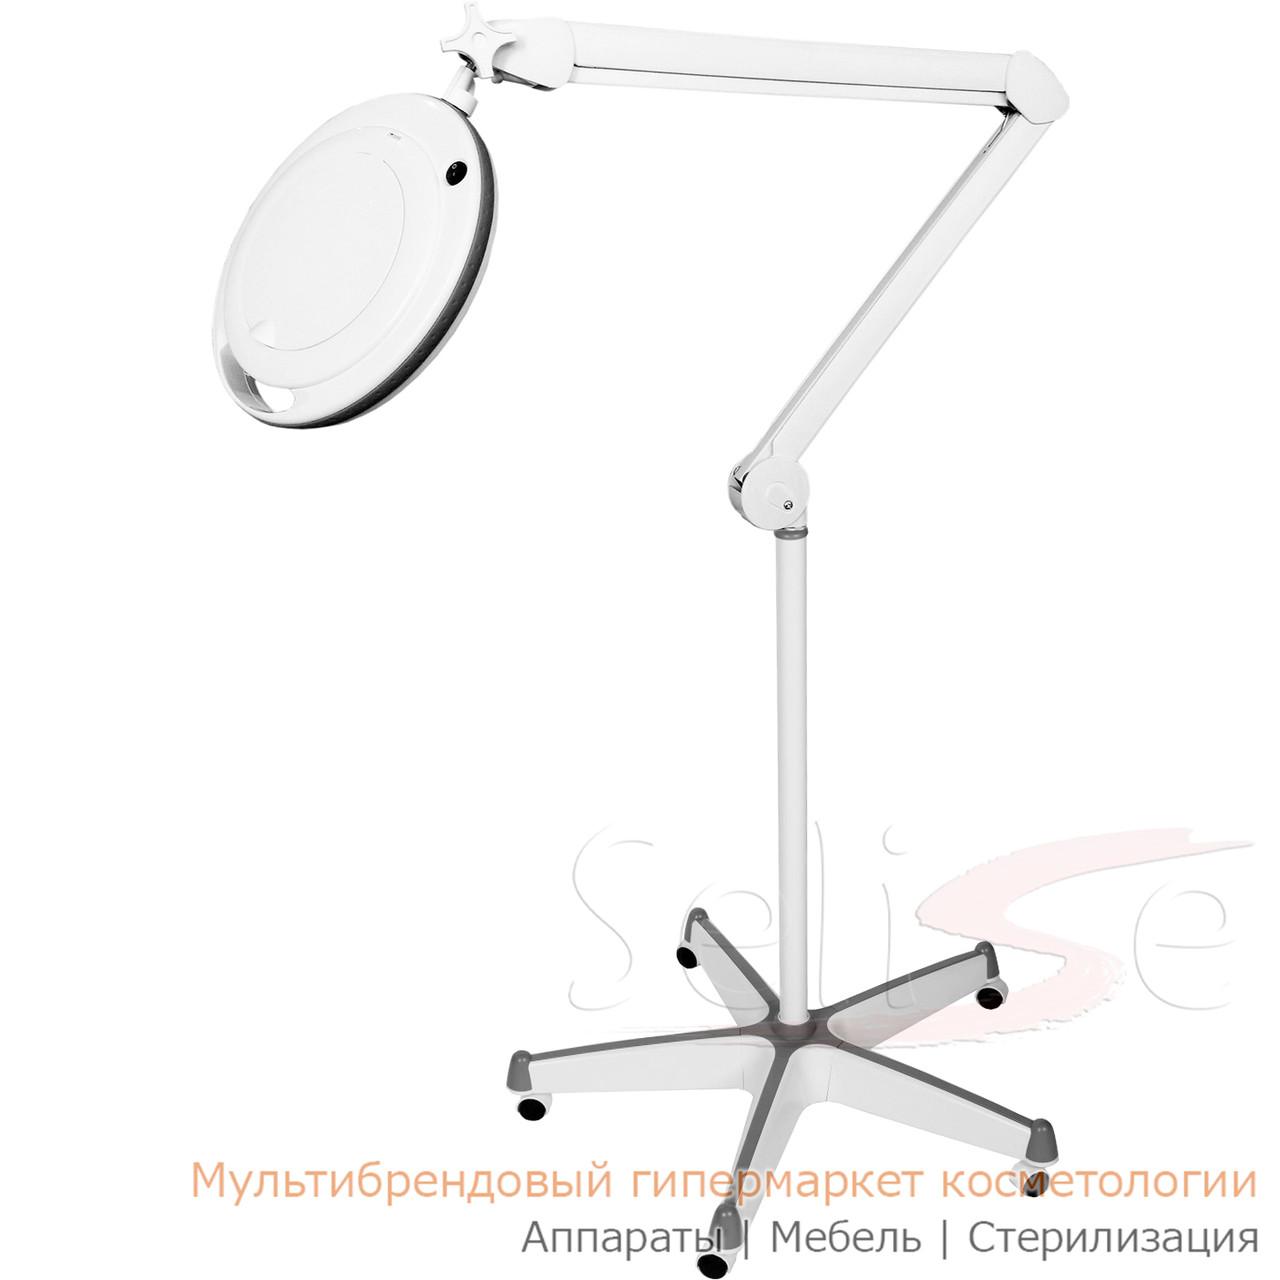 Лампа лупа на штативе 6017 пятилучевой 5А для косметолога, для наращивания ресниц